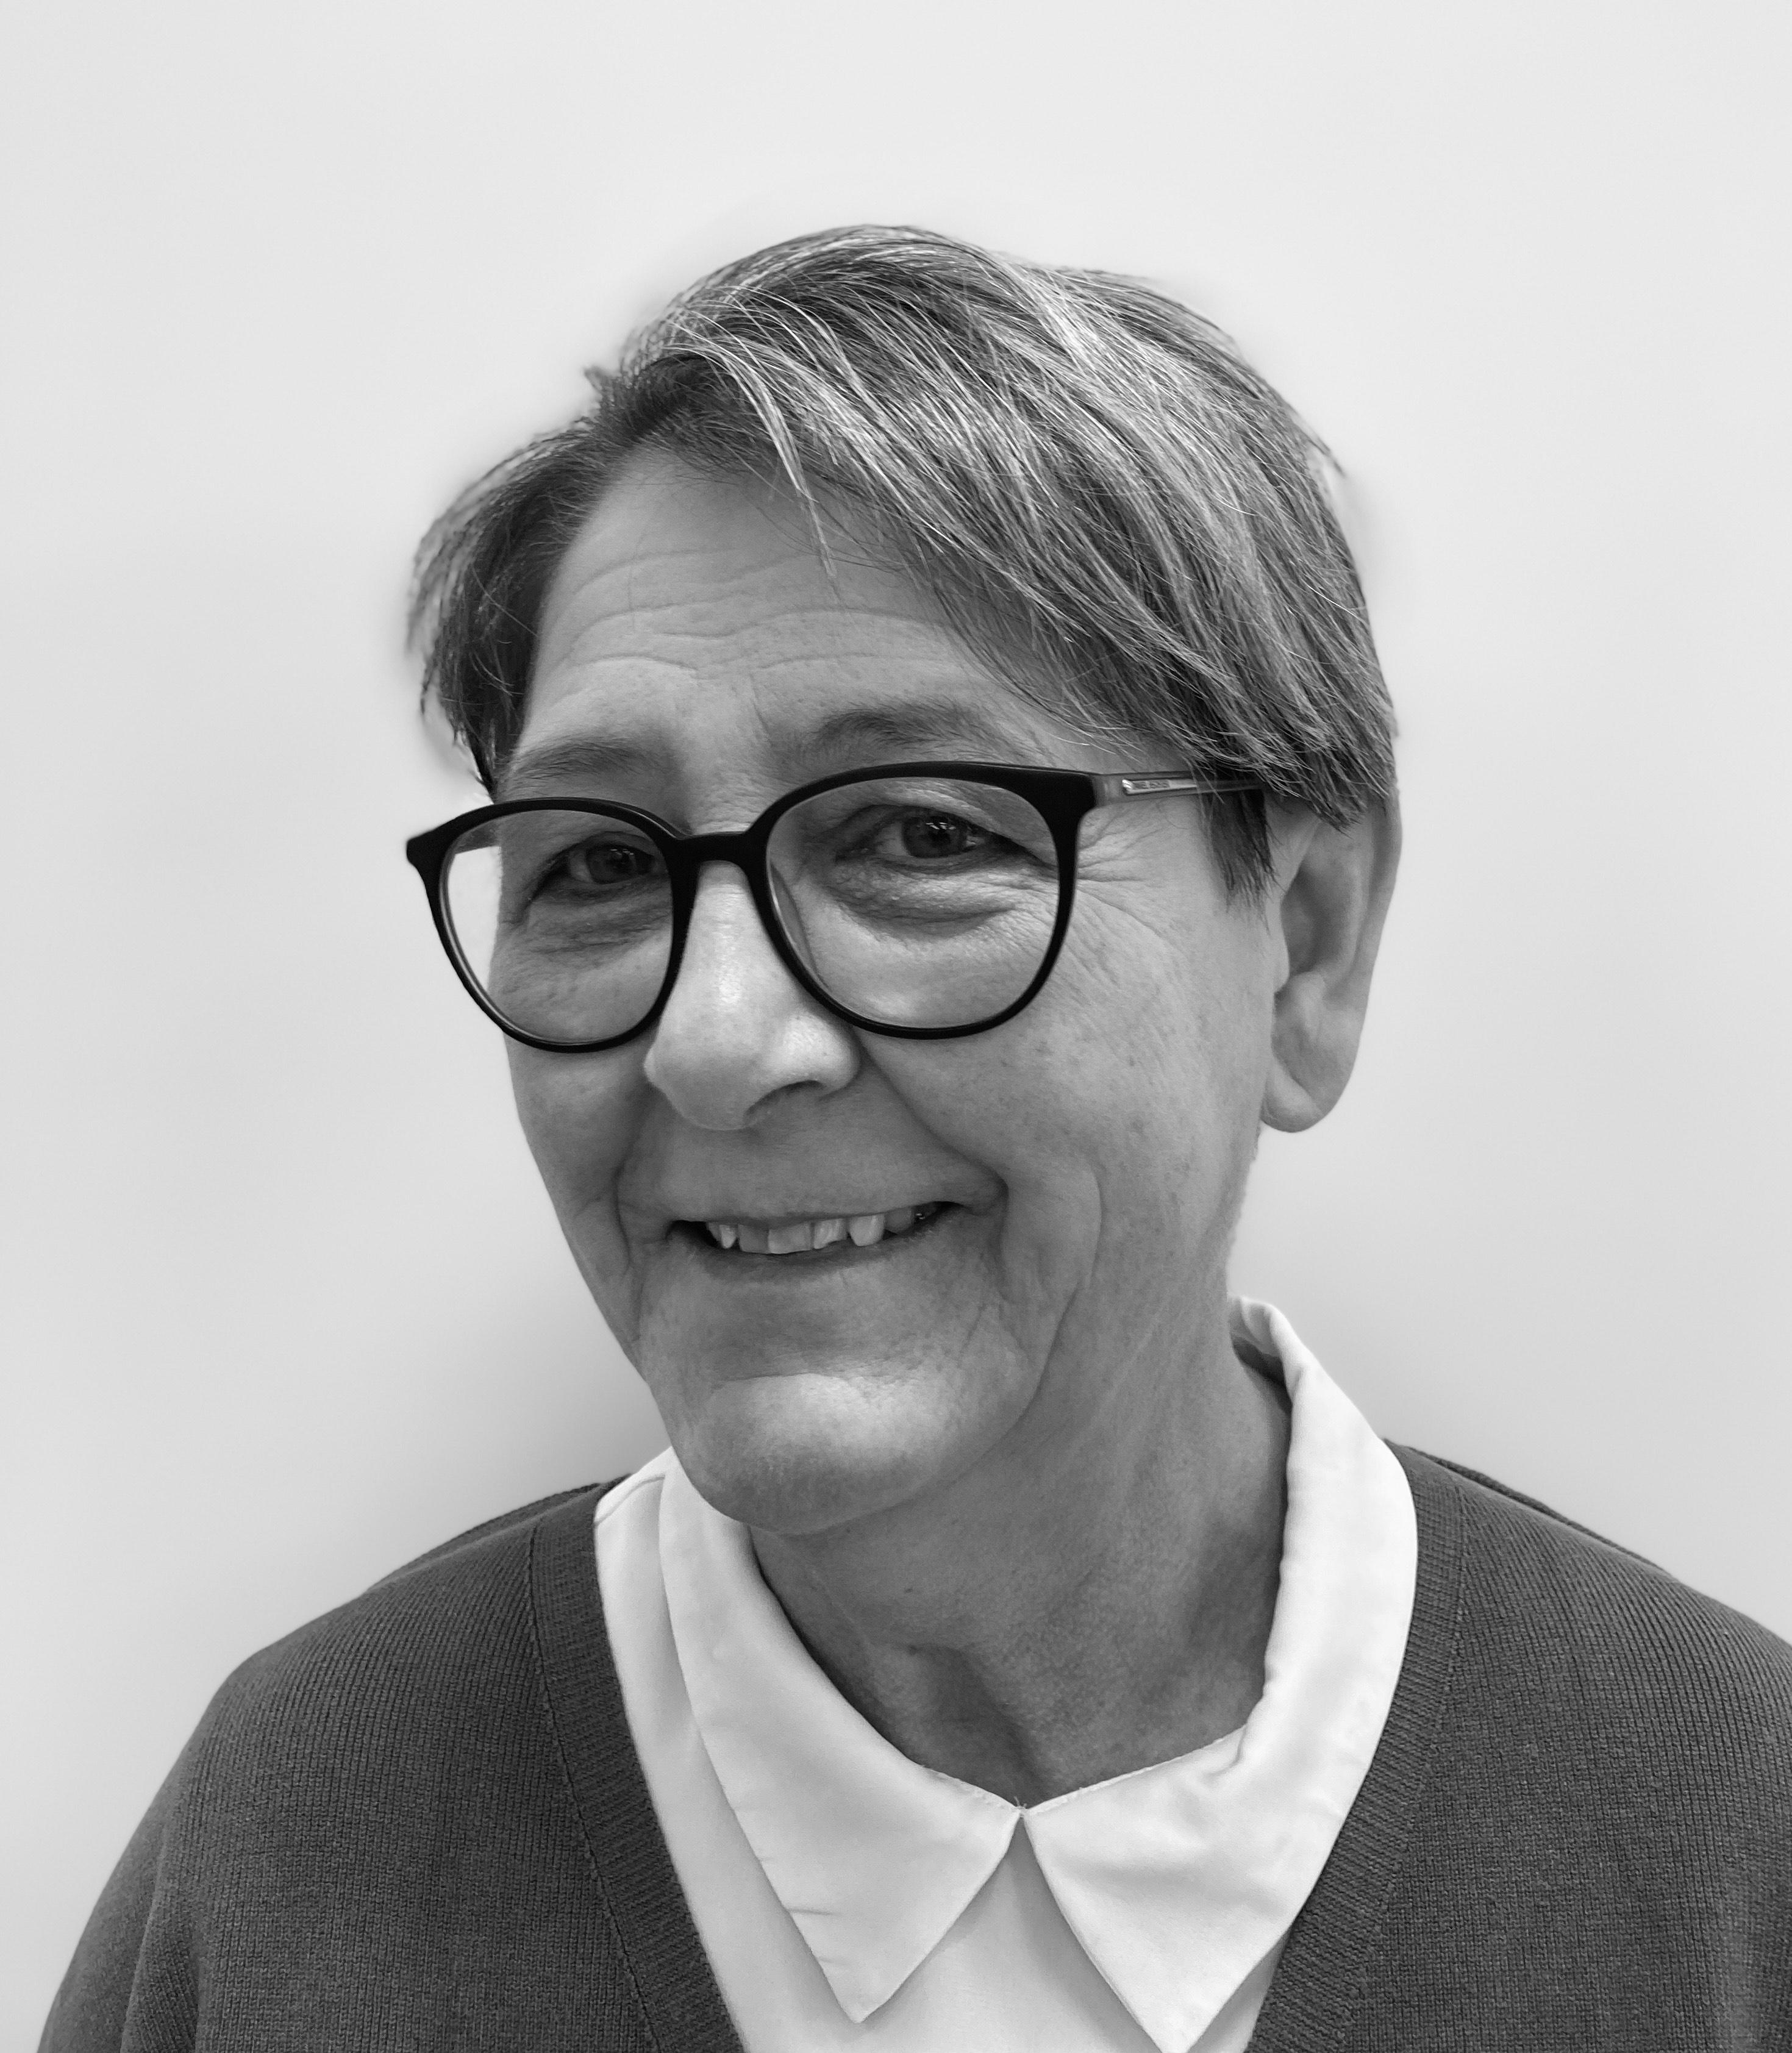 Andrea Scheucher